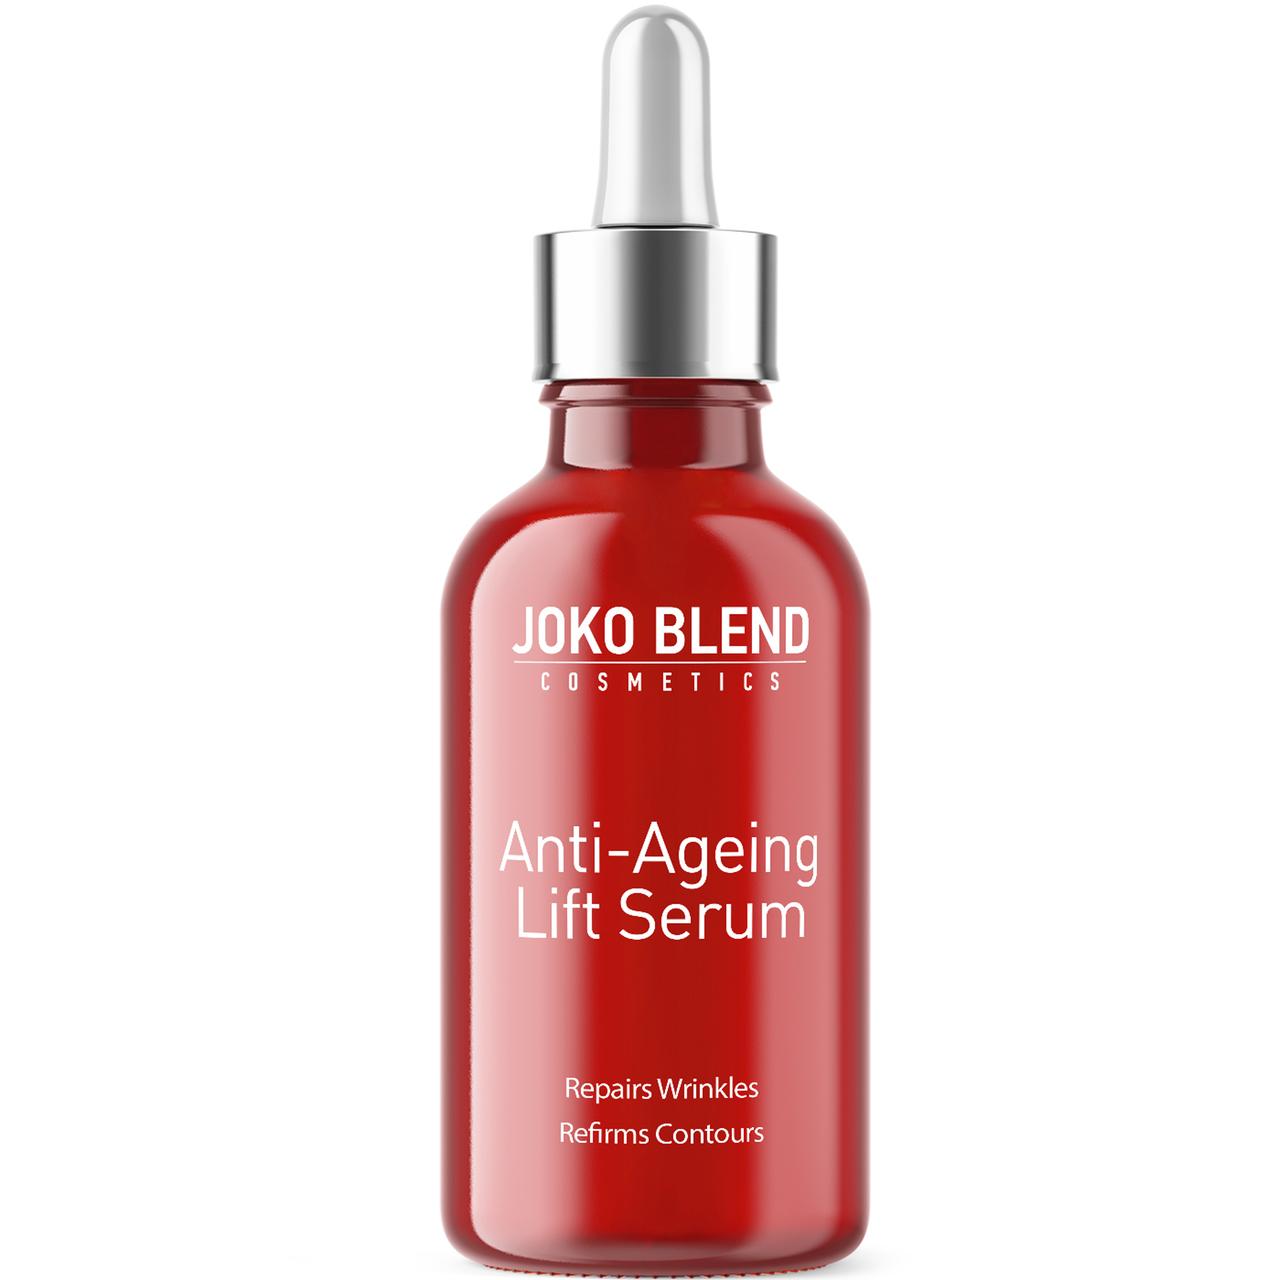 Сироватка, концентрат проти зморшок з ліфтинг-ефектом Anti-Ageing Lift Serum Joko Blend, 30 мл